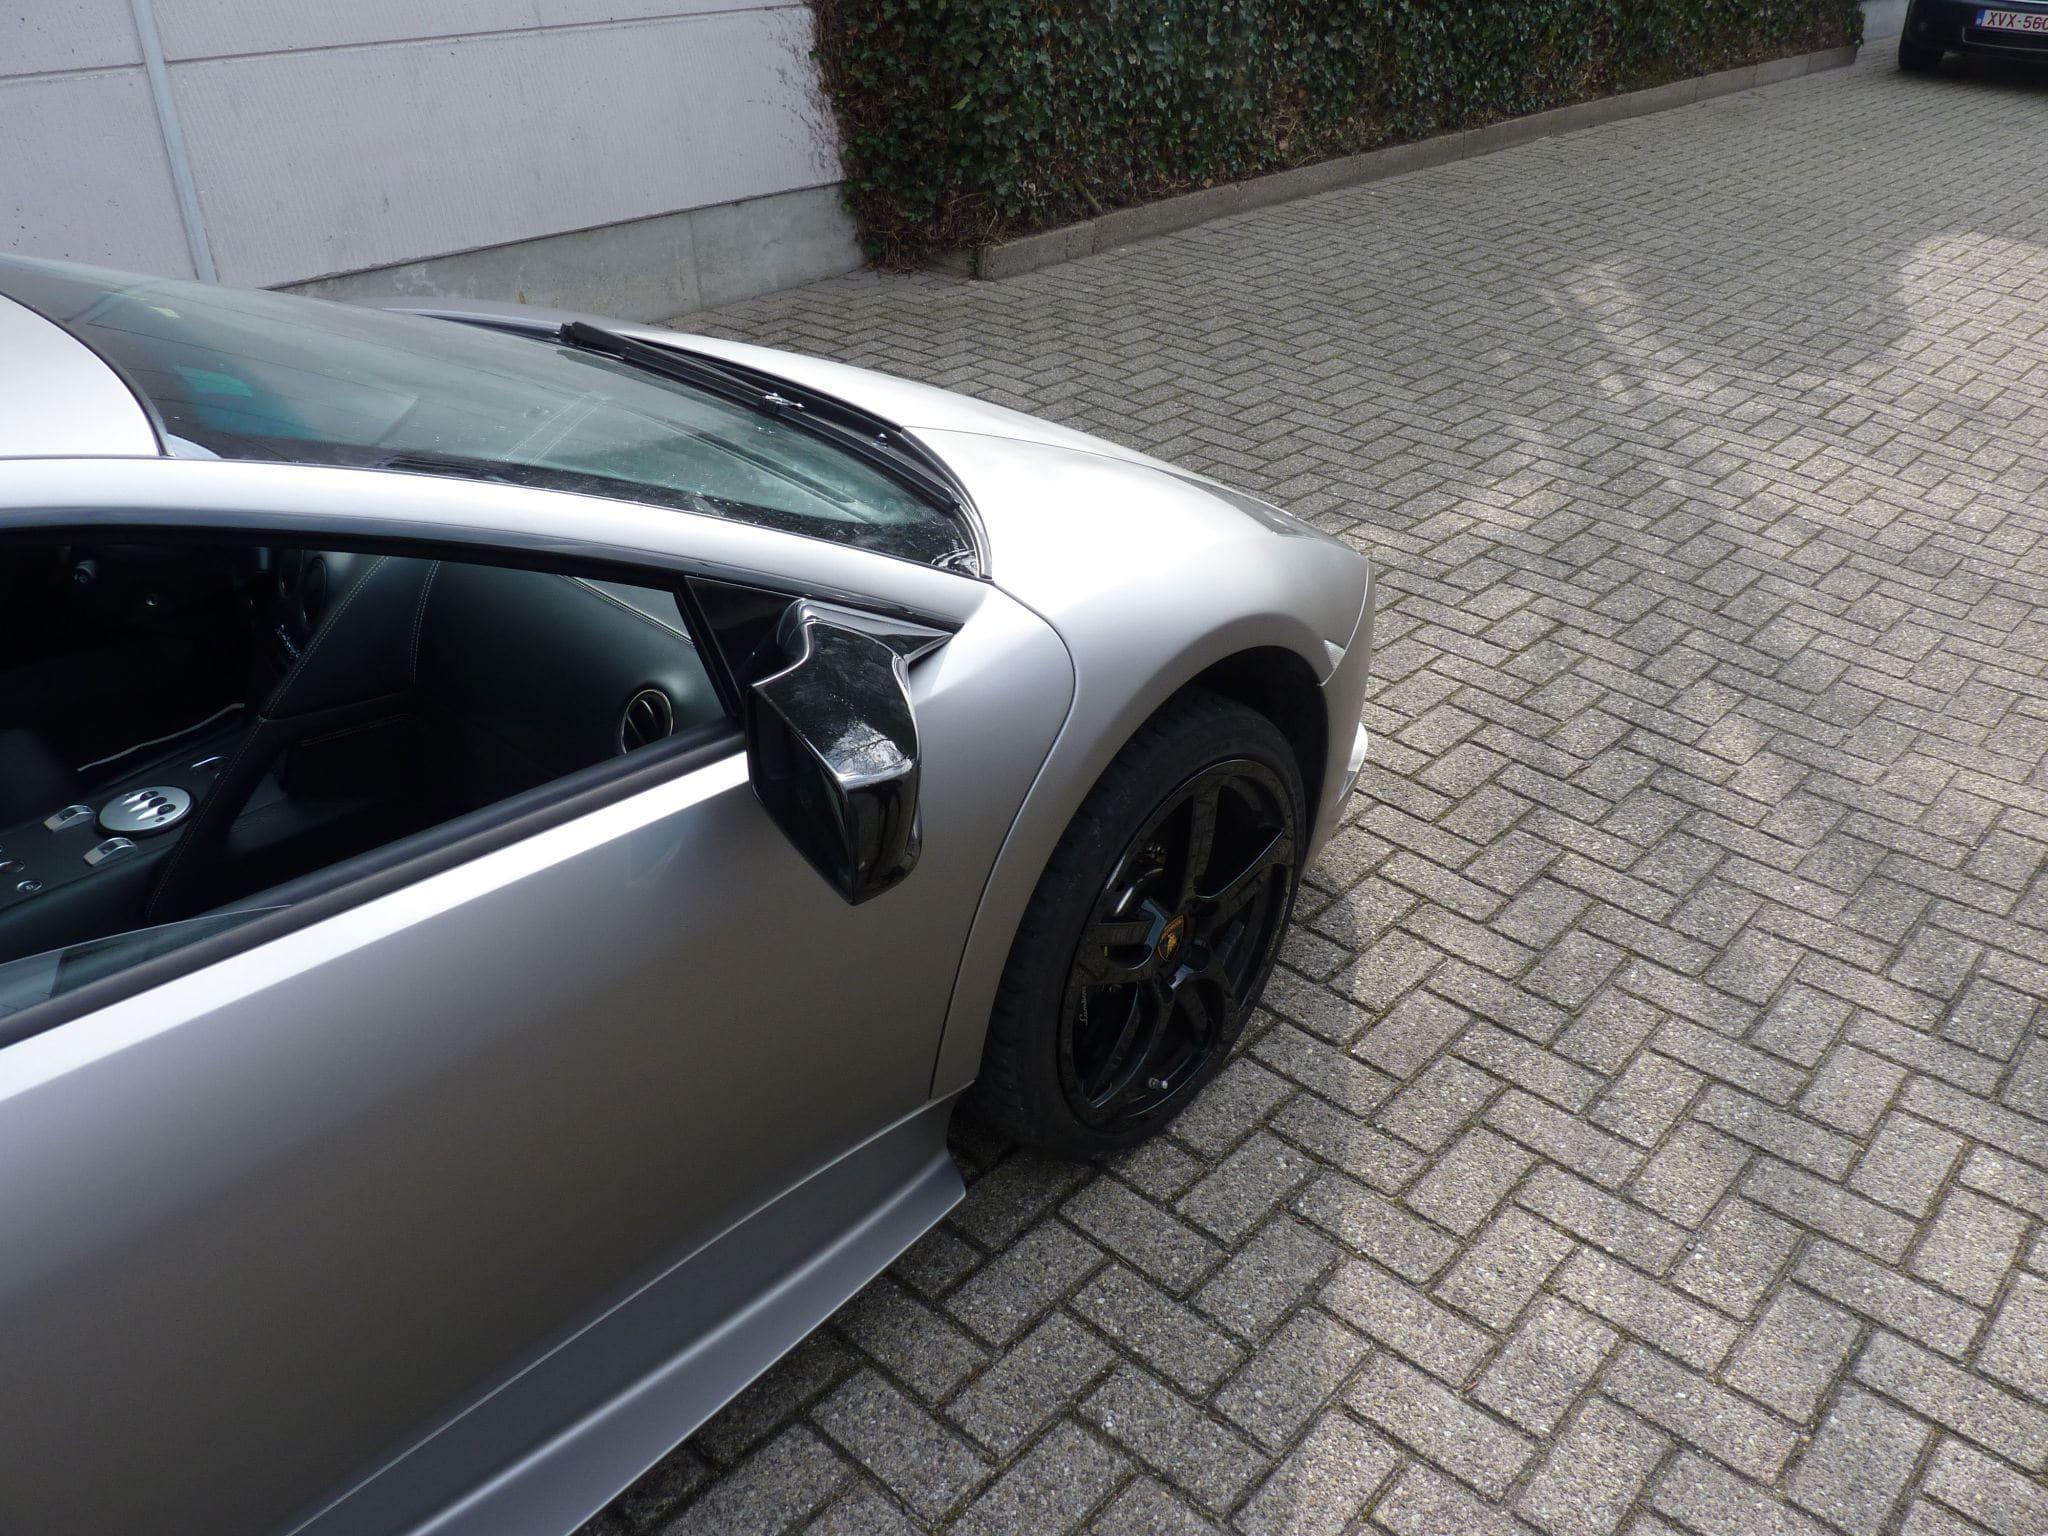 Lamborghini Murcialago LP670 met Gunpowder Wrap, Carwrapping door Wrapmyride.nu Foto-nr:5997, ©2021